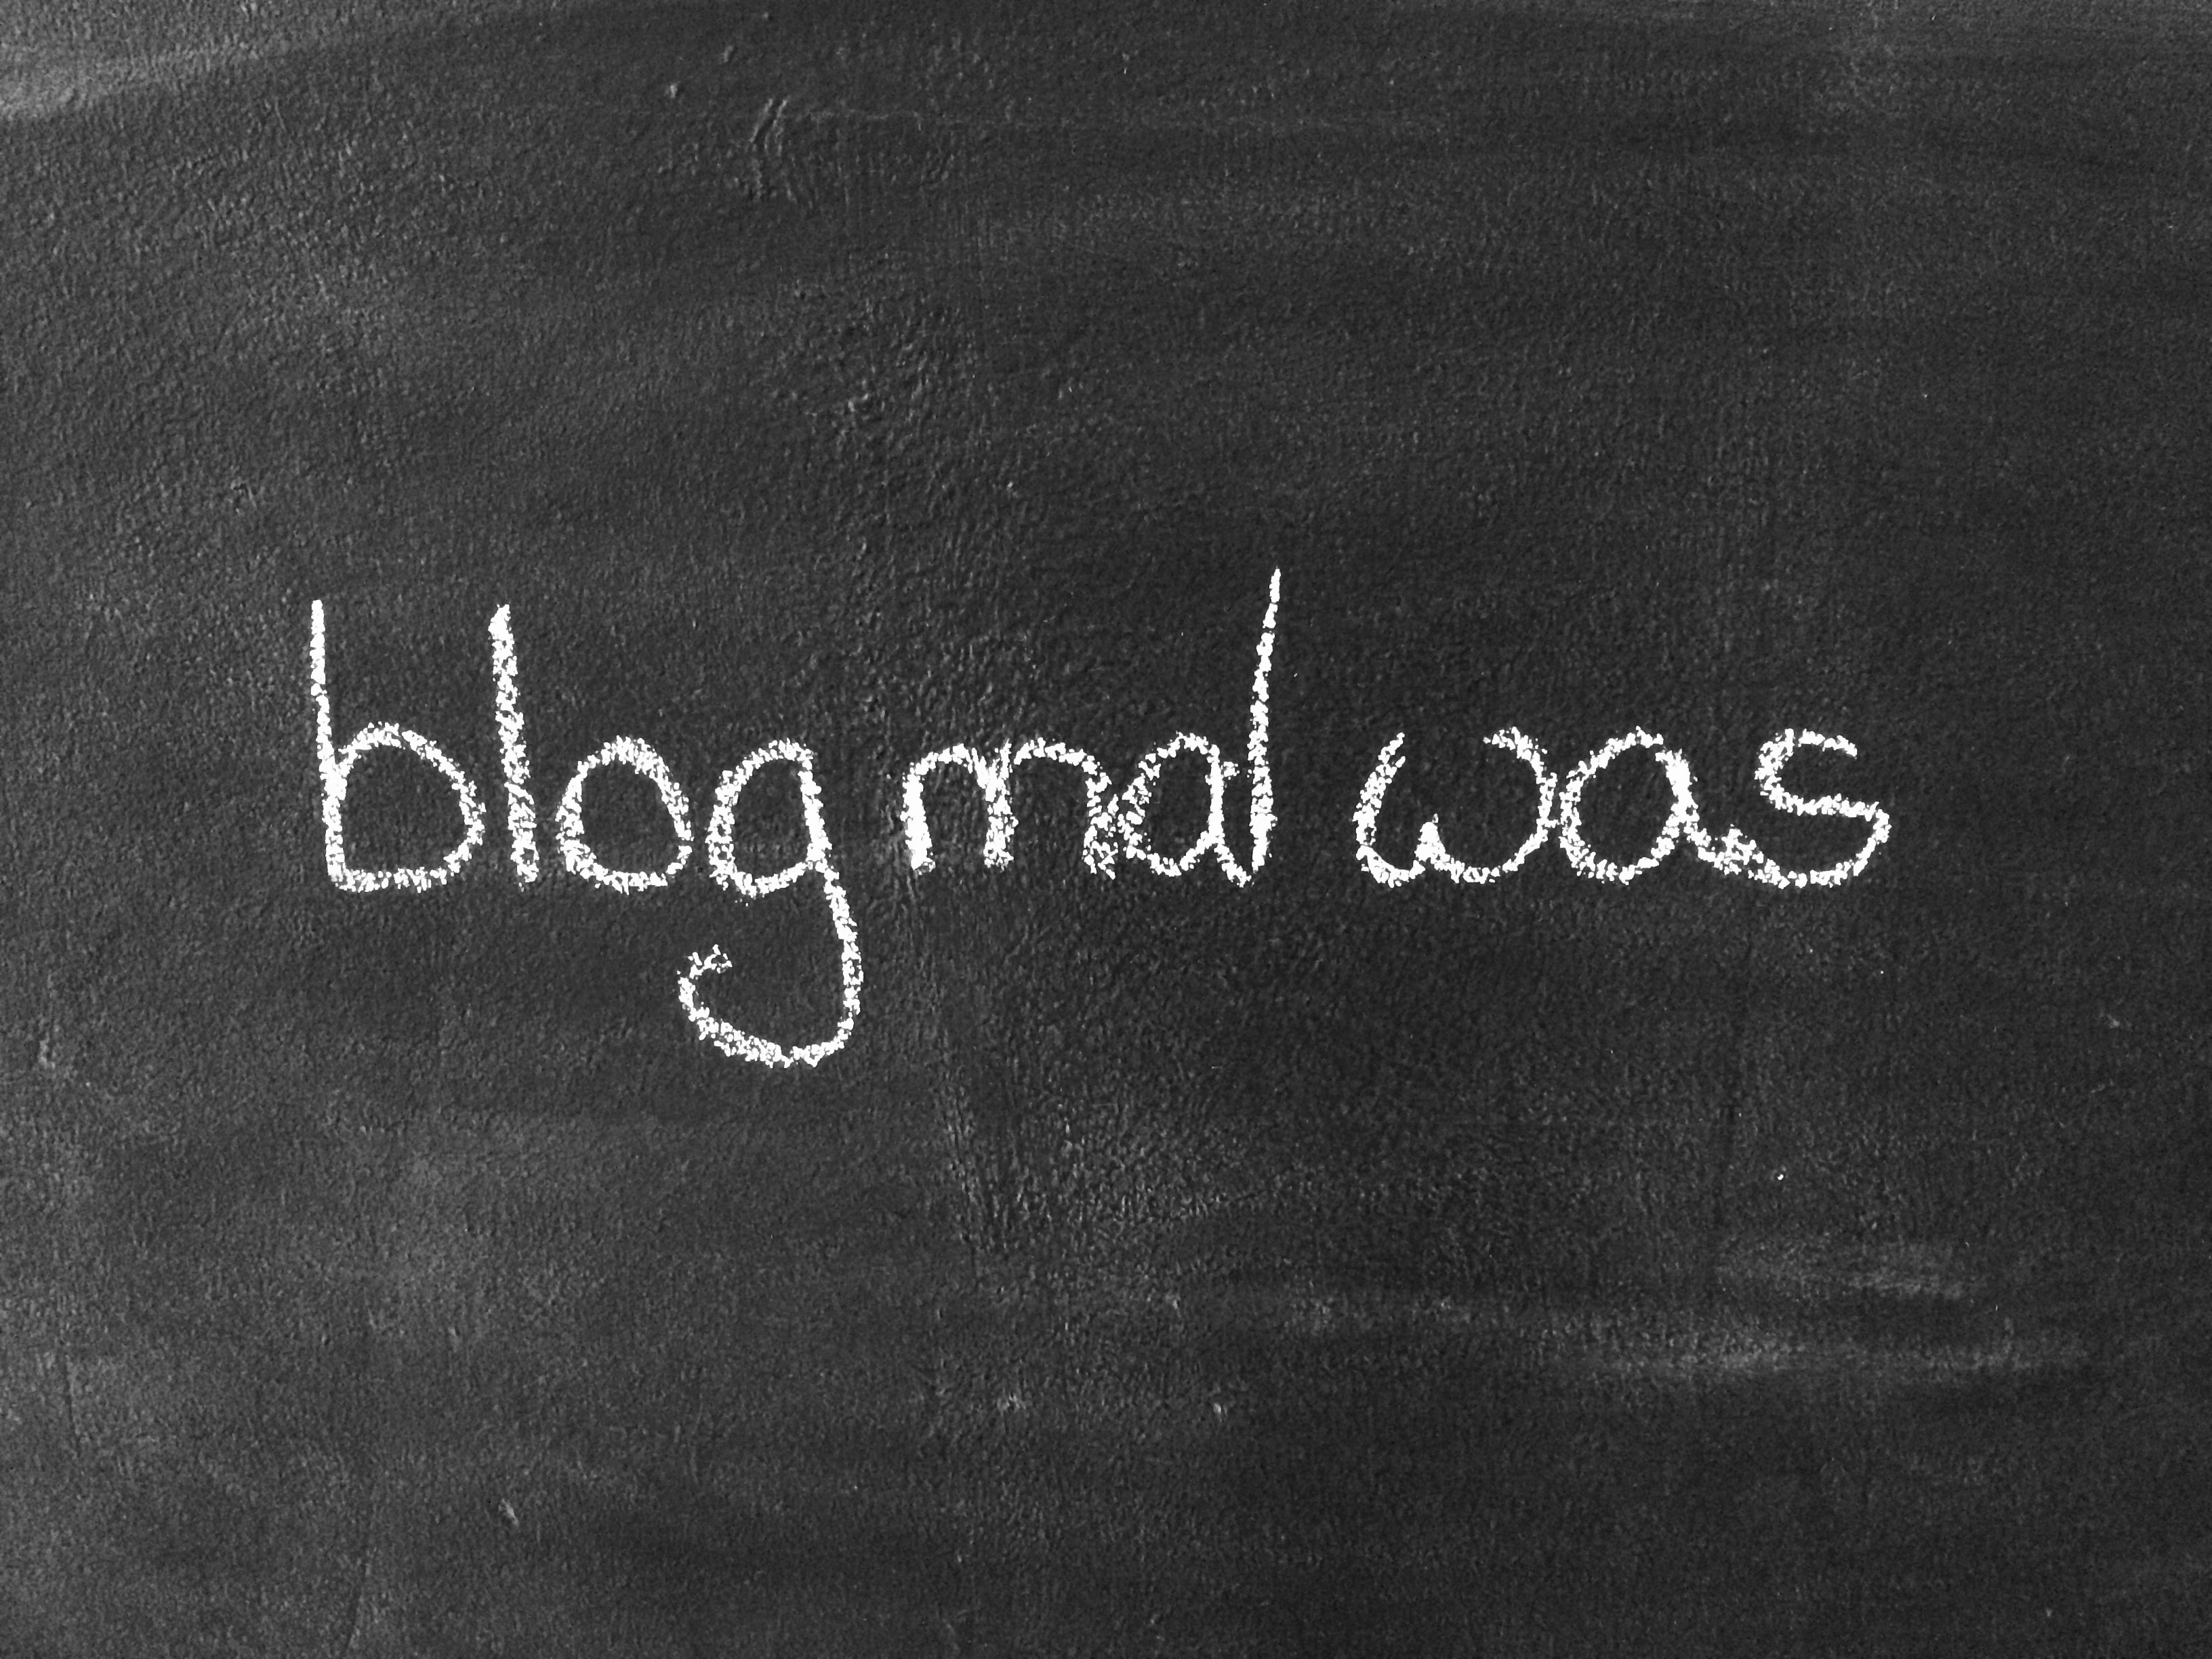 Blog mal was